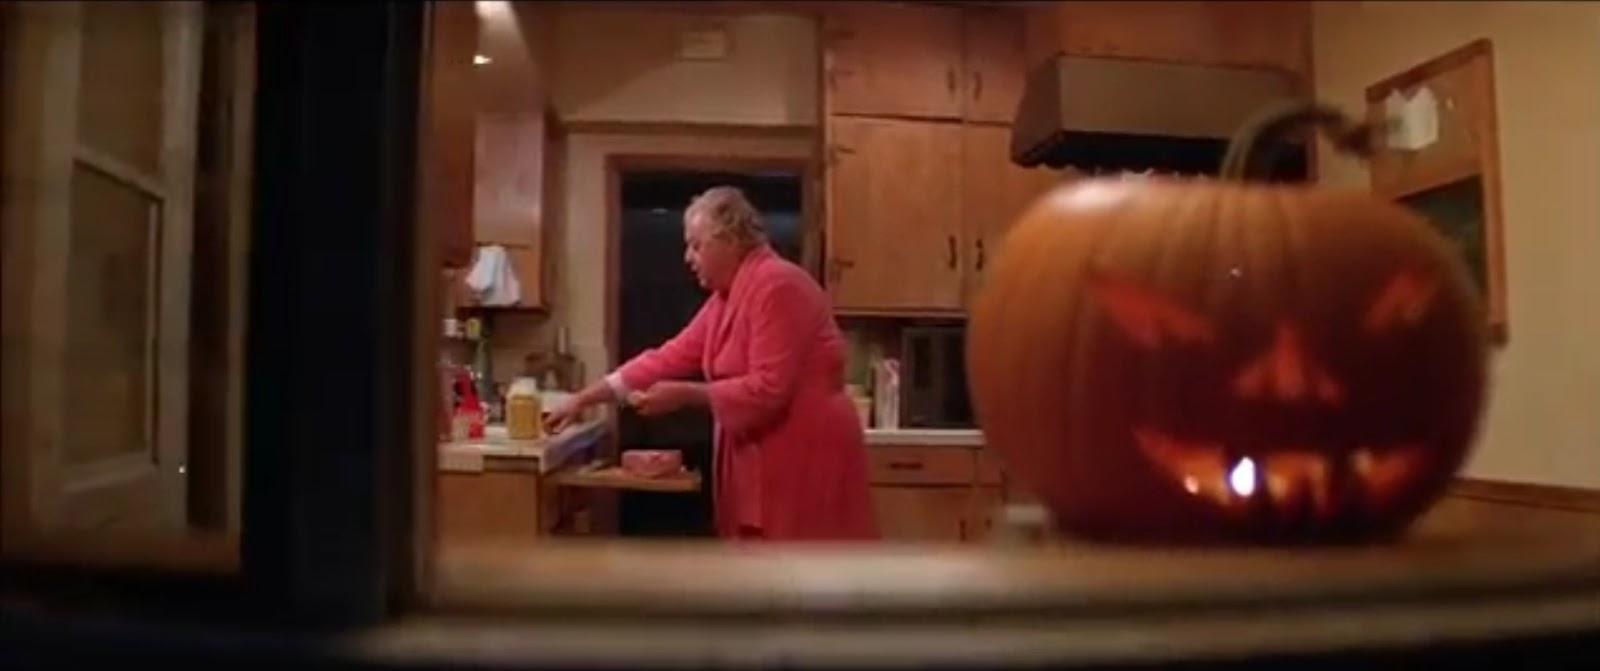 halloween ii myers in window - Halloween 2 1981 Full Movie